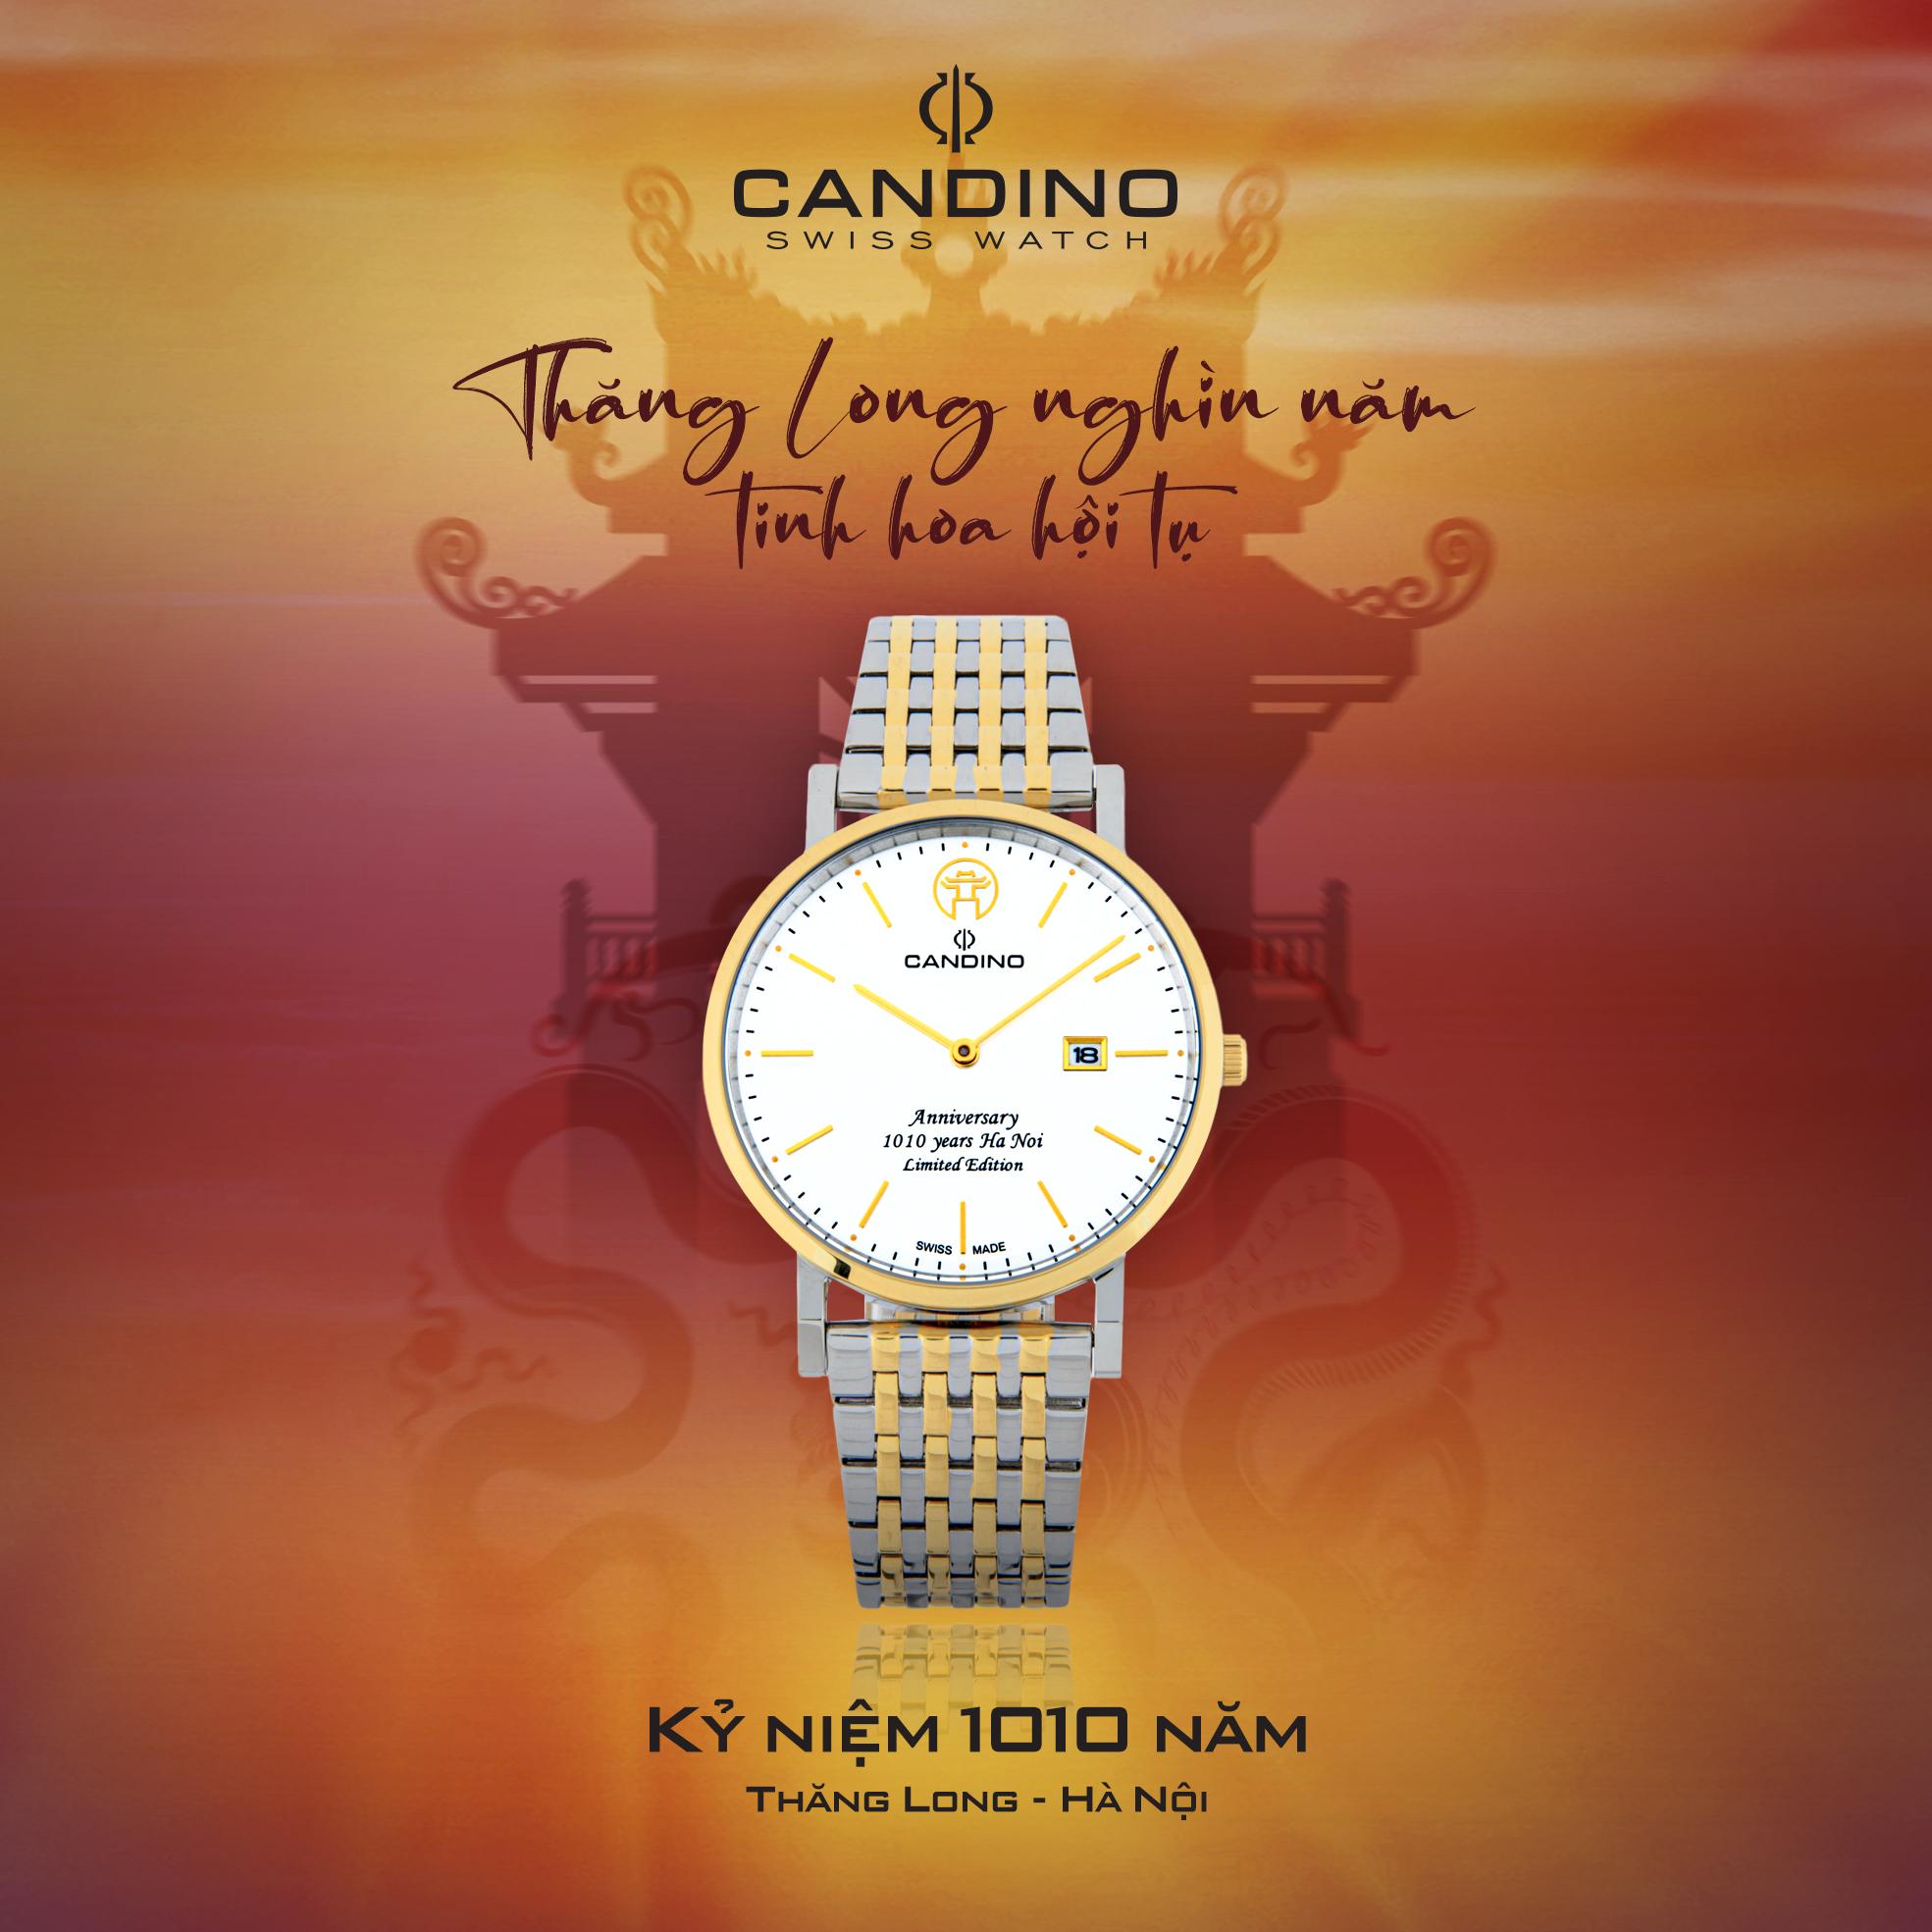 Đồng hồ nam CANDINO 1010